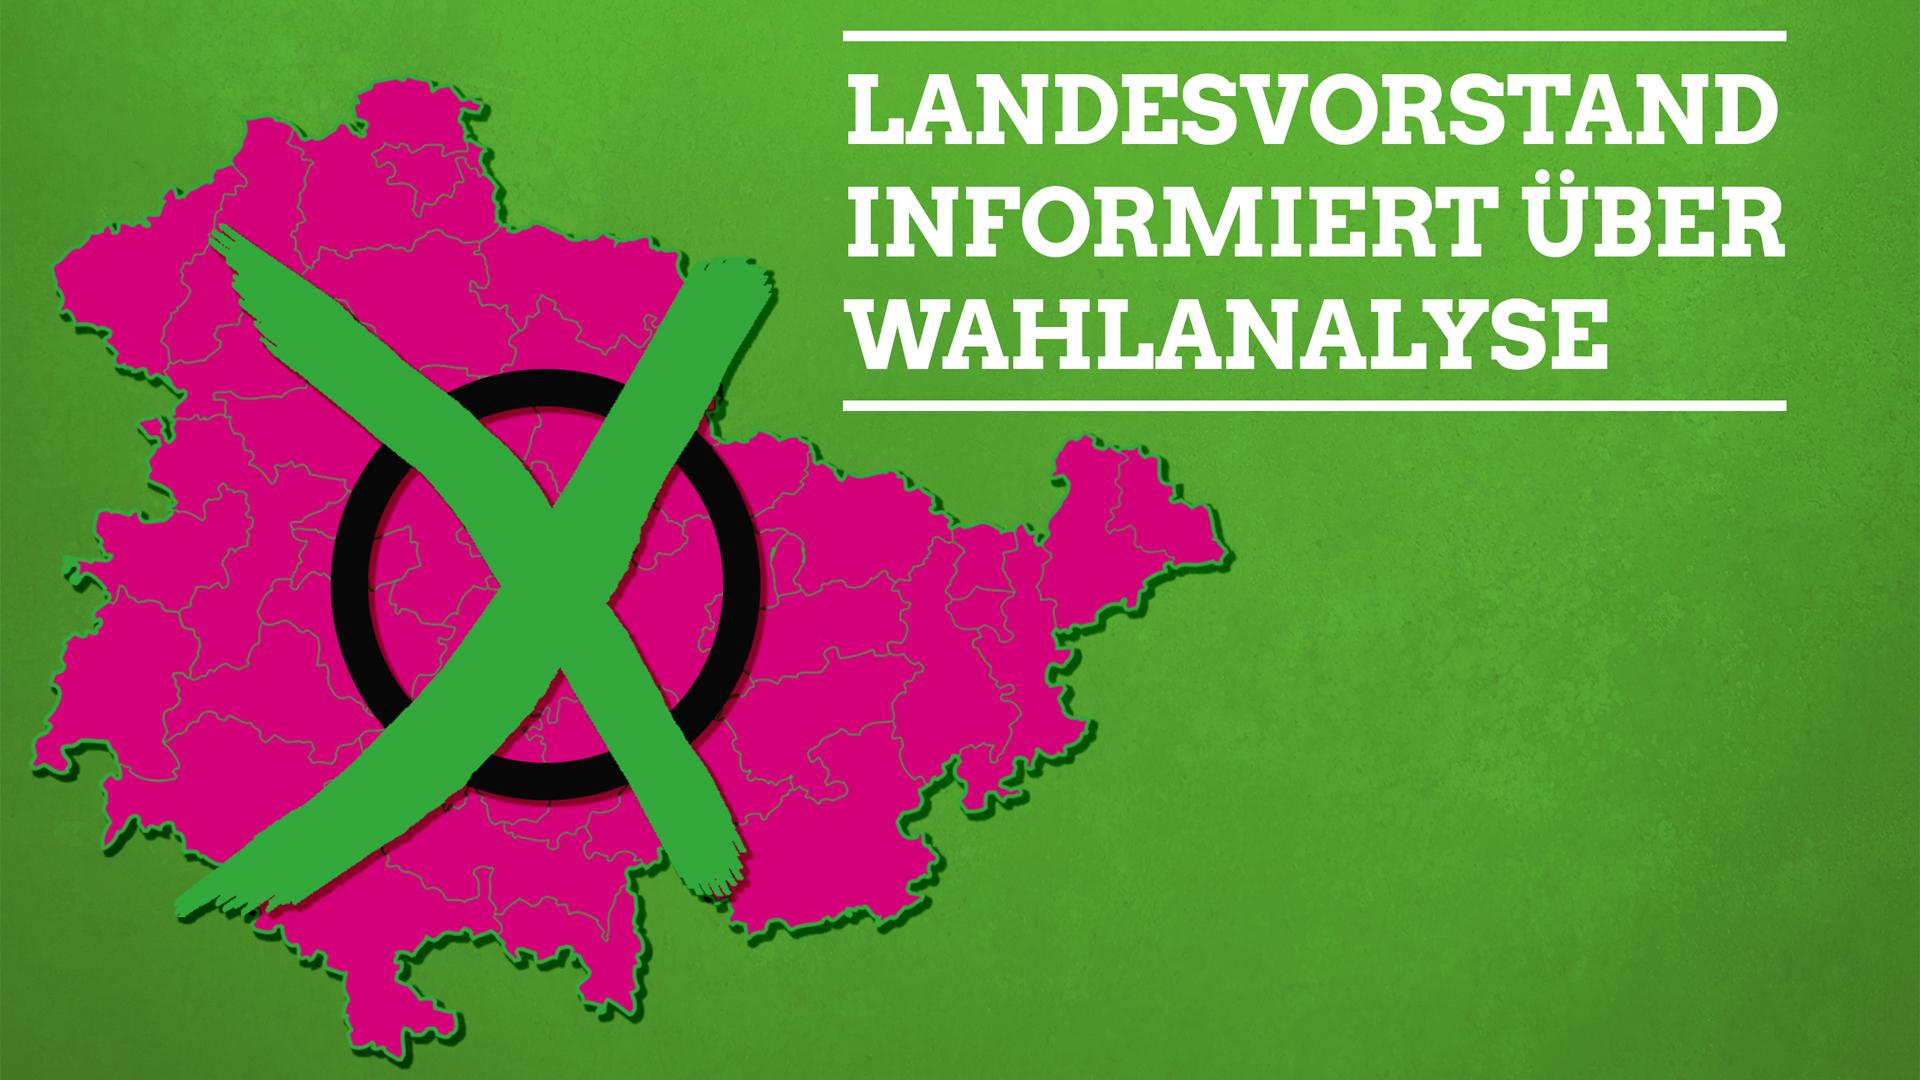 Landtagswahl 2019 – Landesvorstand informiert über Wahlanalyse